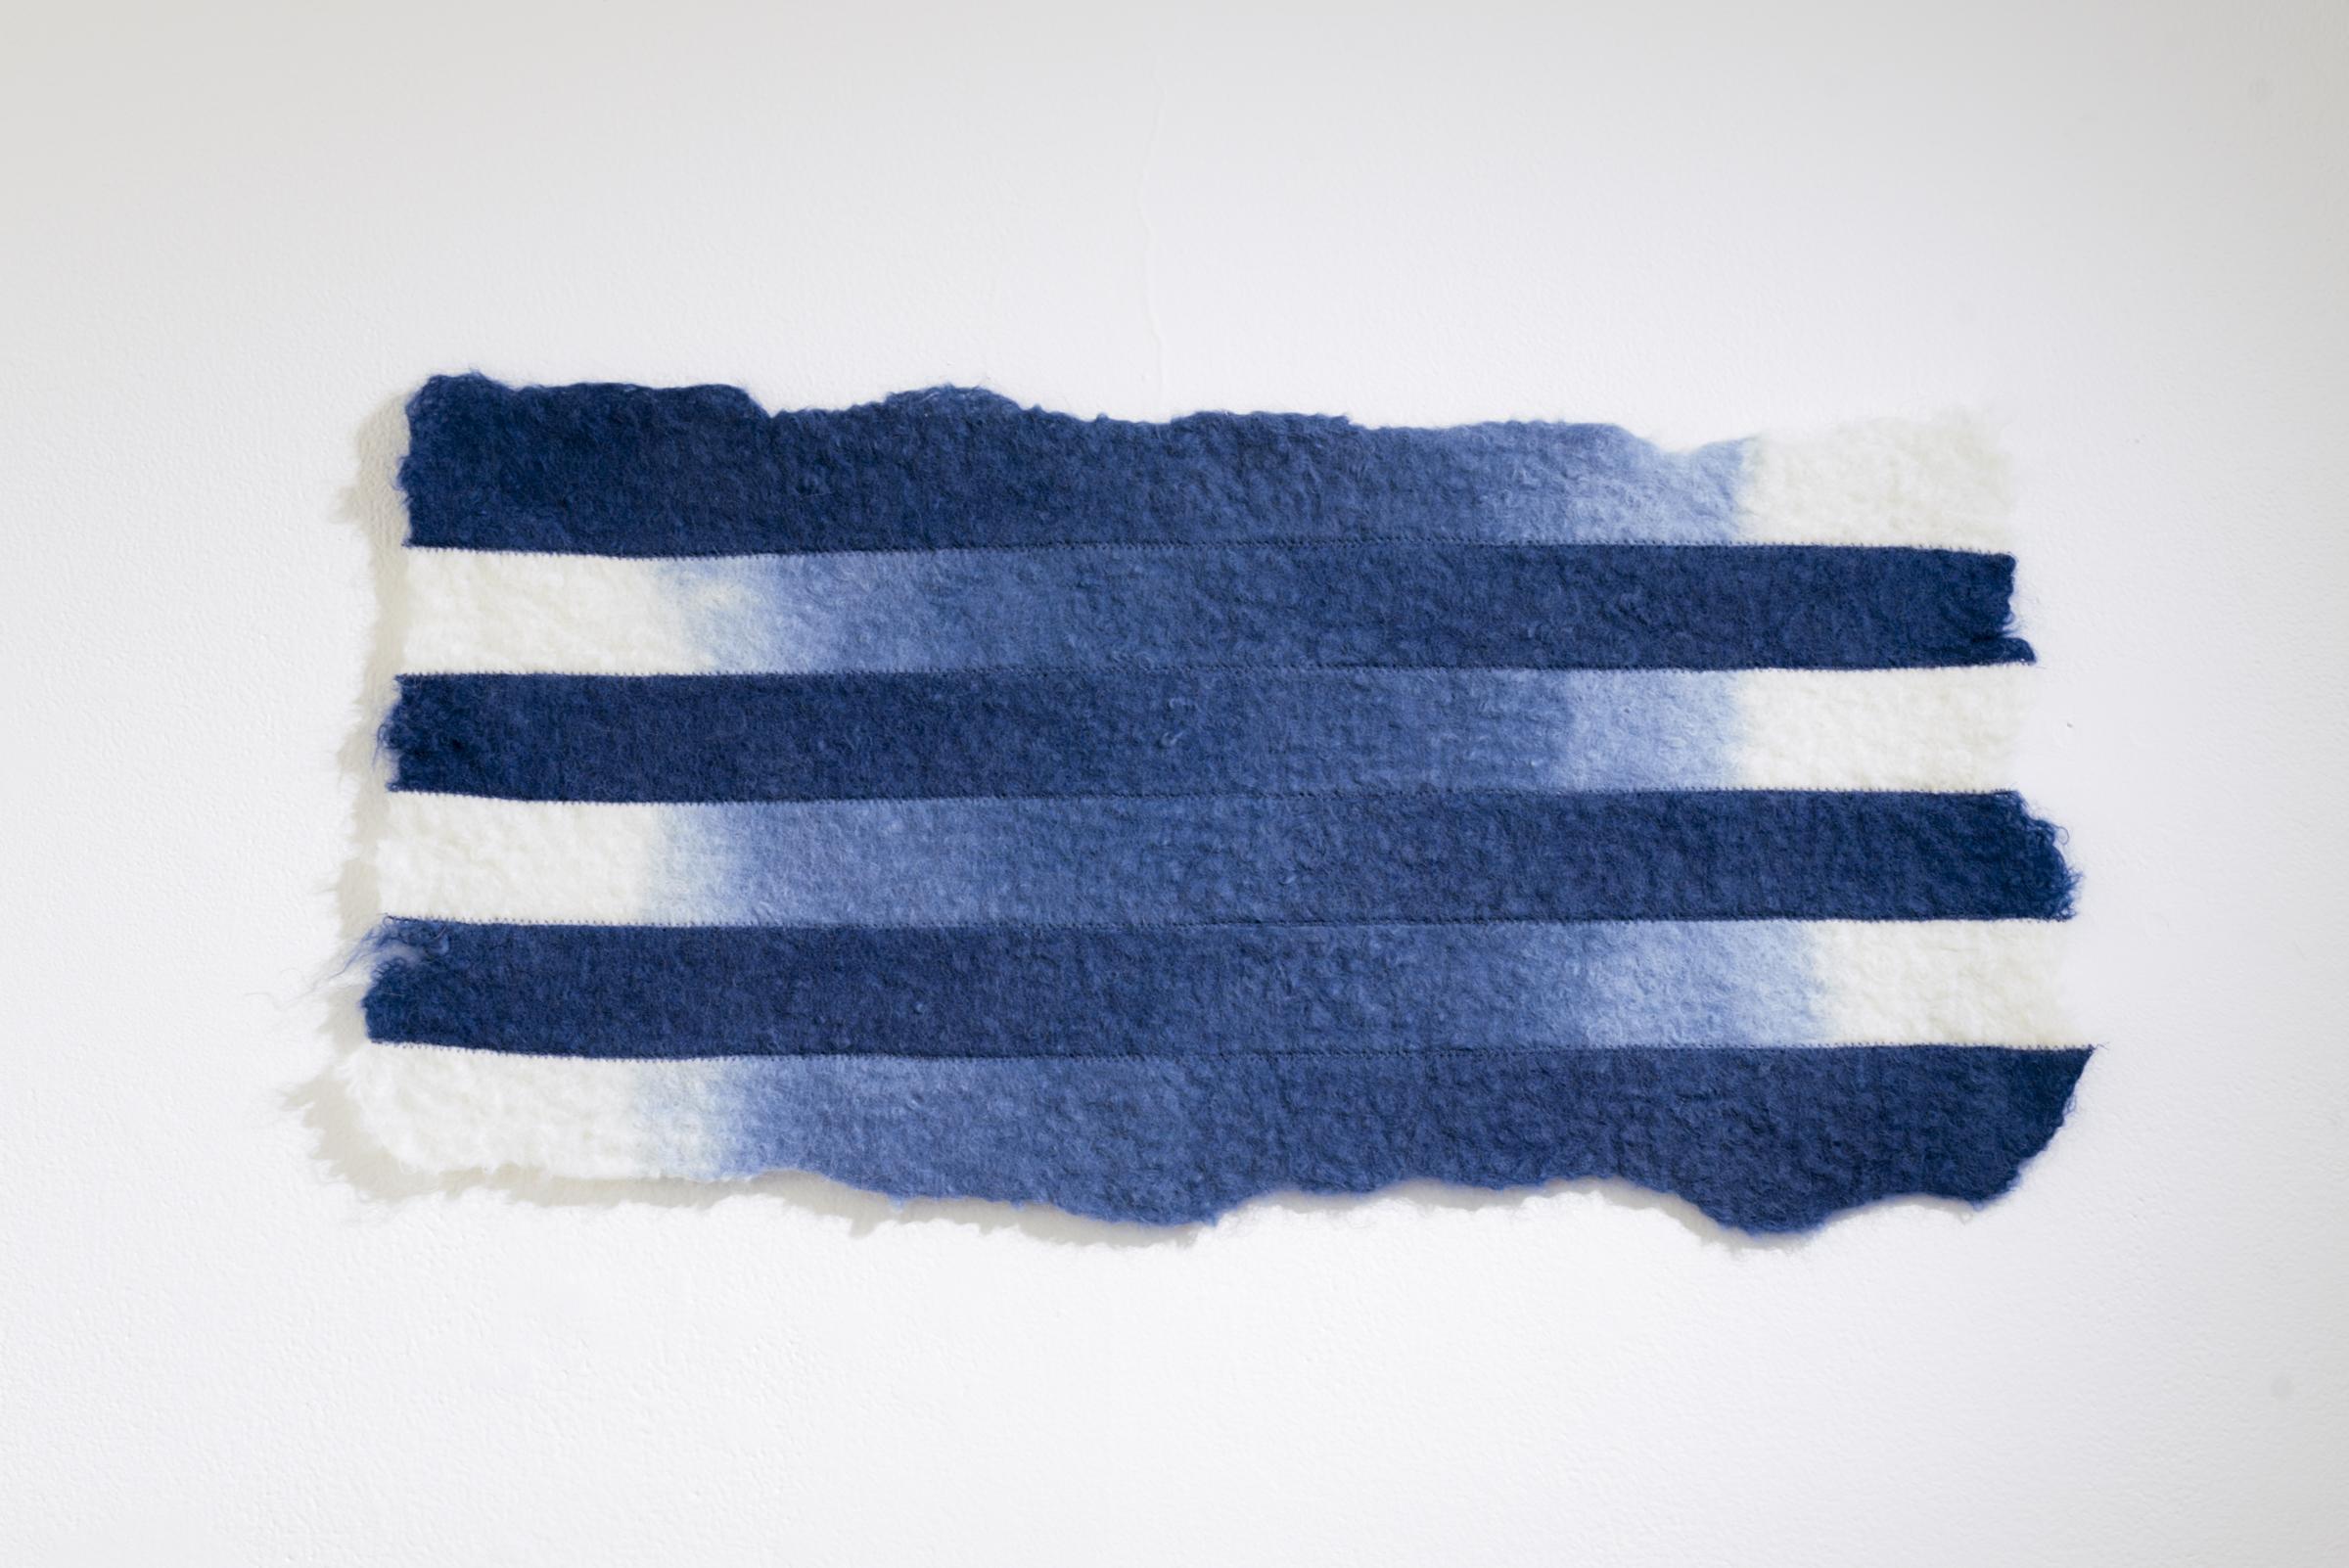 Dip, Snip and Flip, 2016, wet felted Romney-Tisdale sheep fleece, thread, and indigo dye, 32 x 64cm.